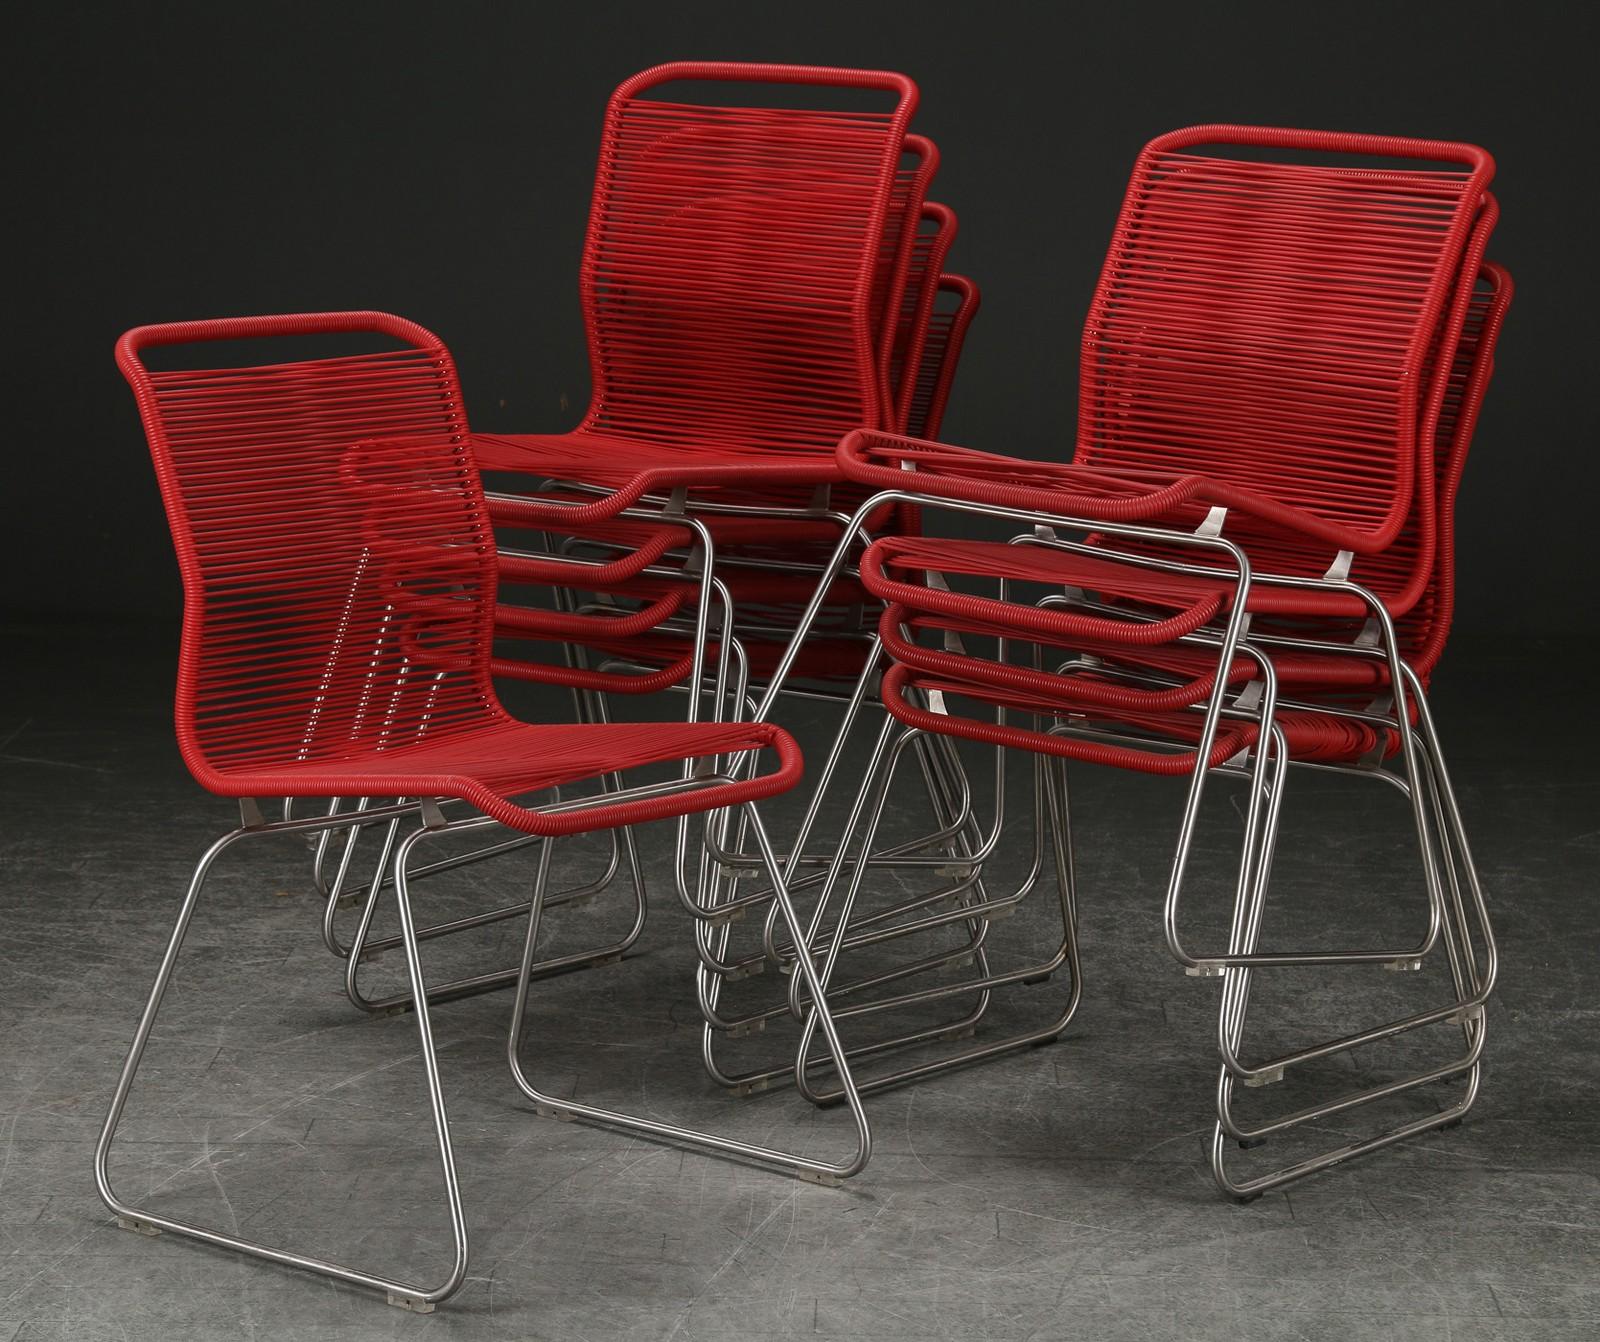 Utmerket Auktionstipset - Verner Panton. Sæt på ni 'Tivoli' stole (9) PL-94